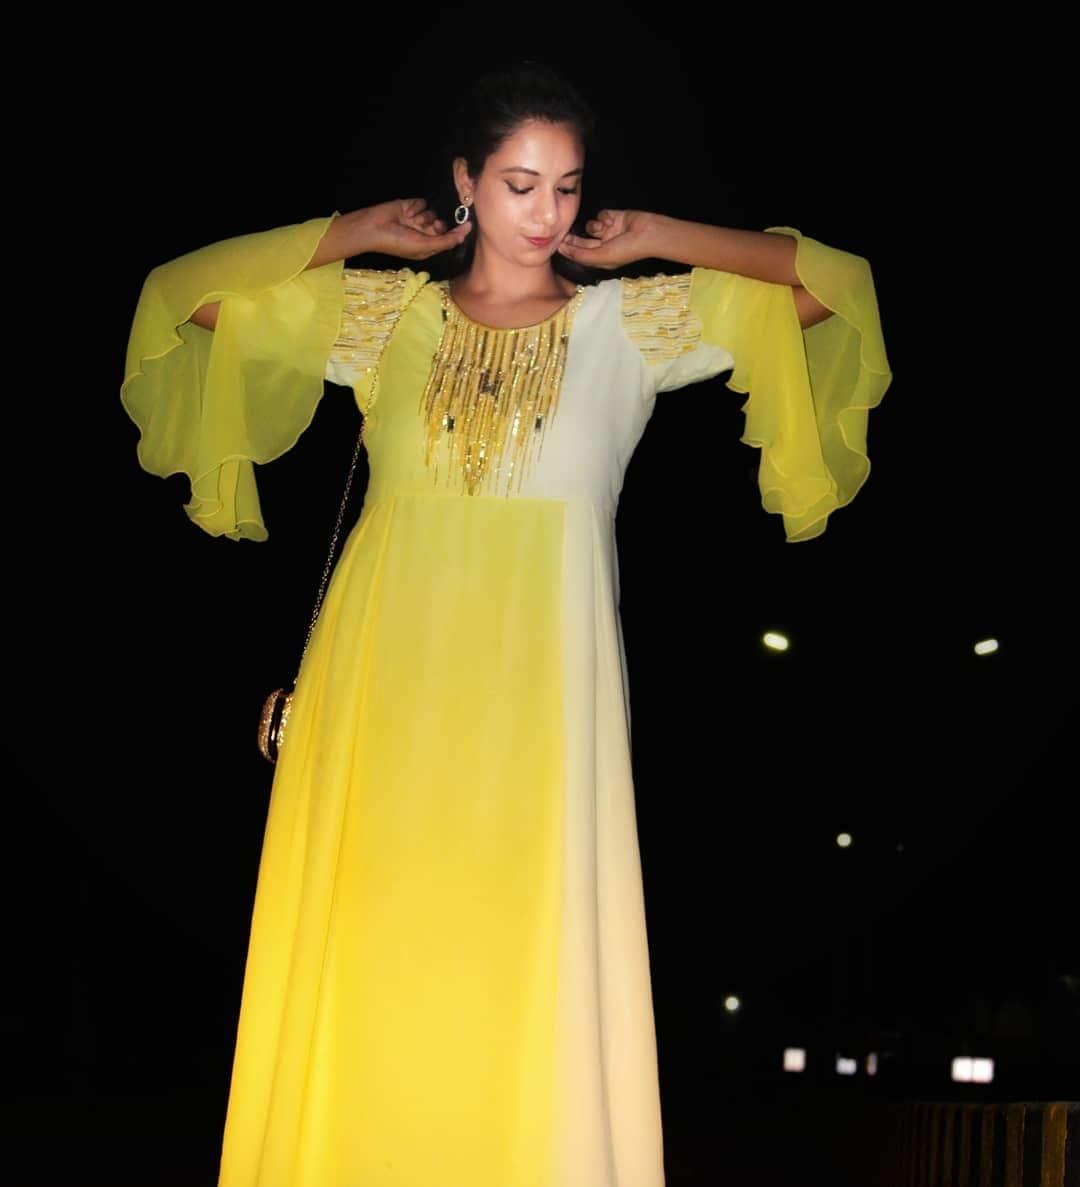 #ruffles #rufflesleeves #summertrends ##fashionalert #ootnight #sassysakshi #weekendoutfit